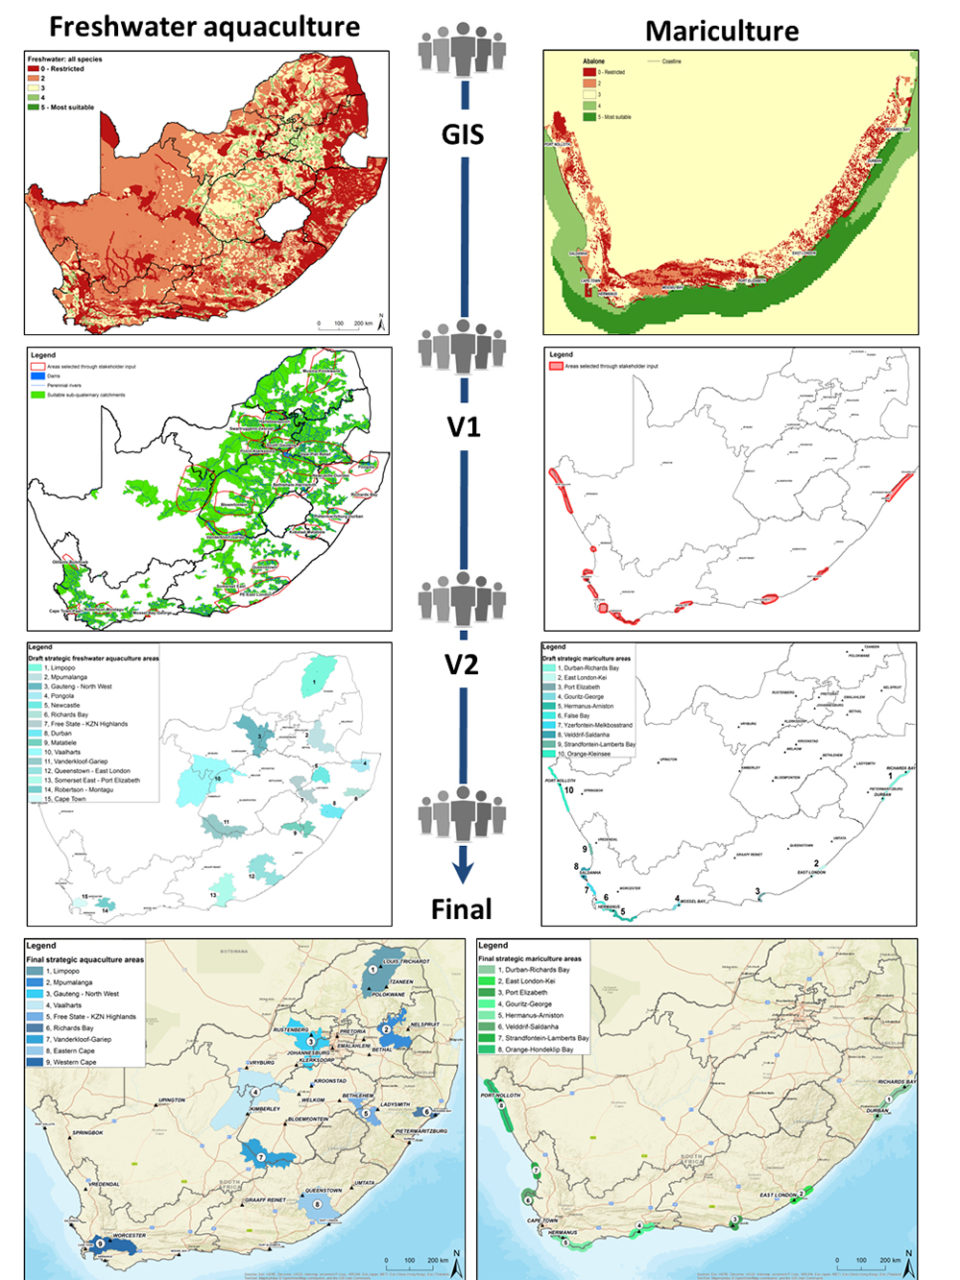 South Africa strategic environmental assessment